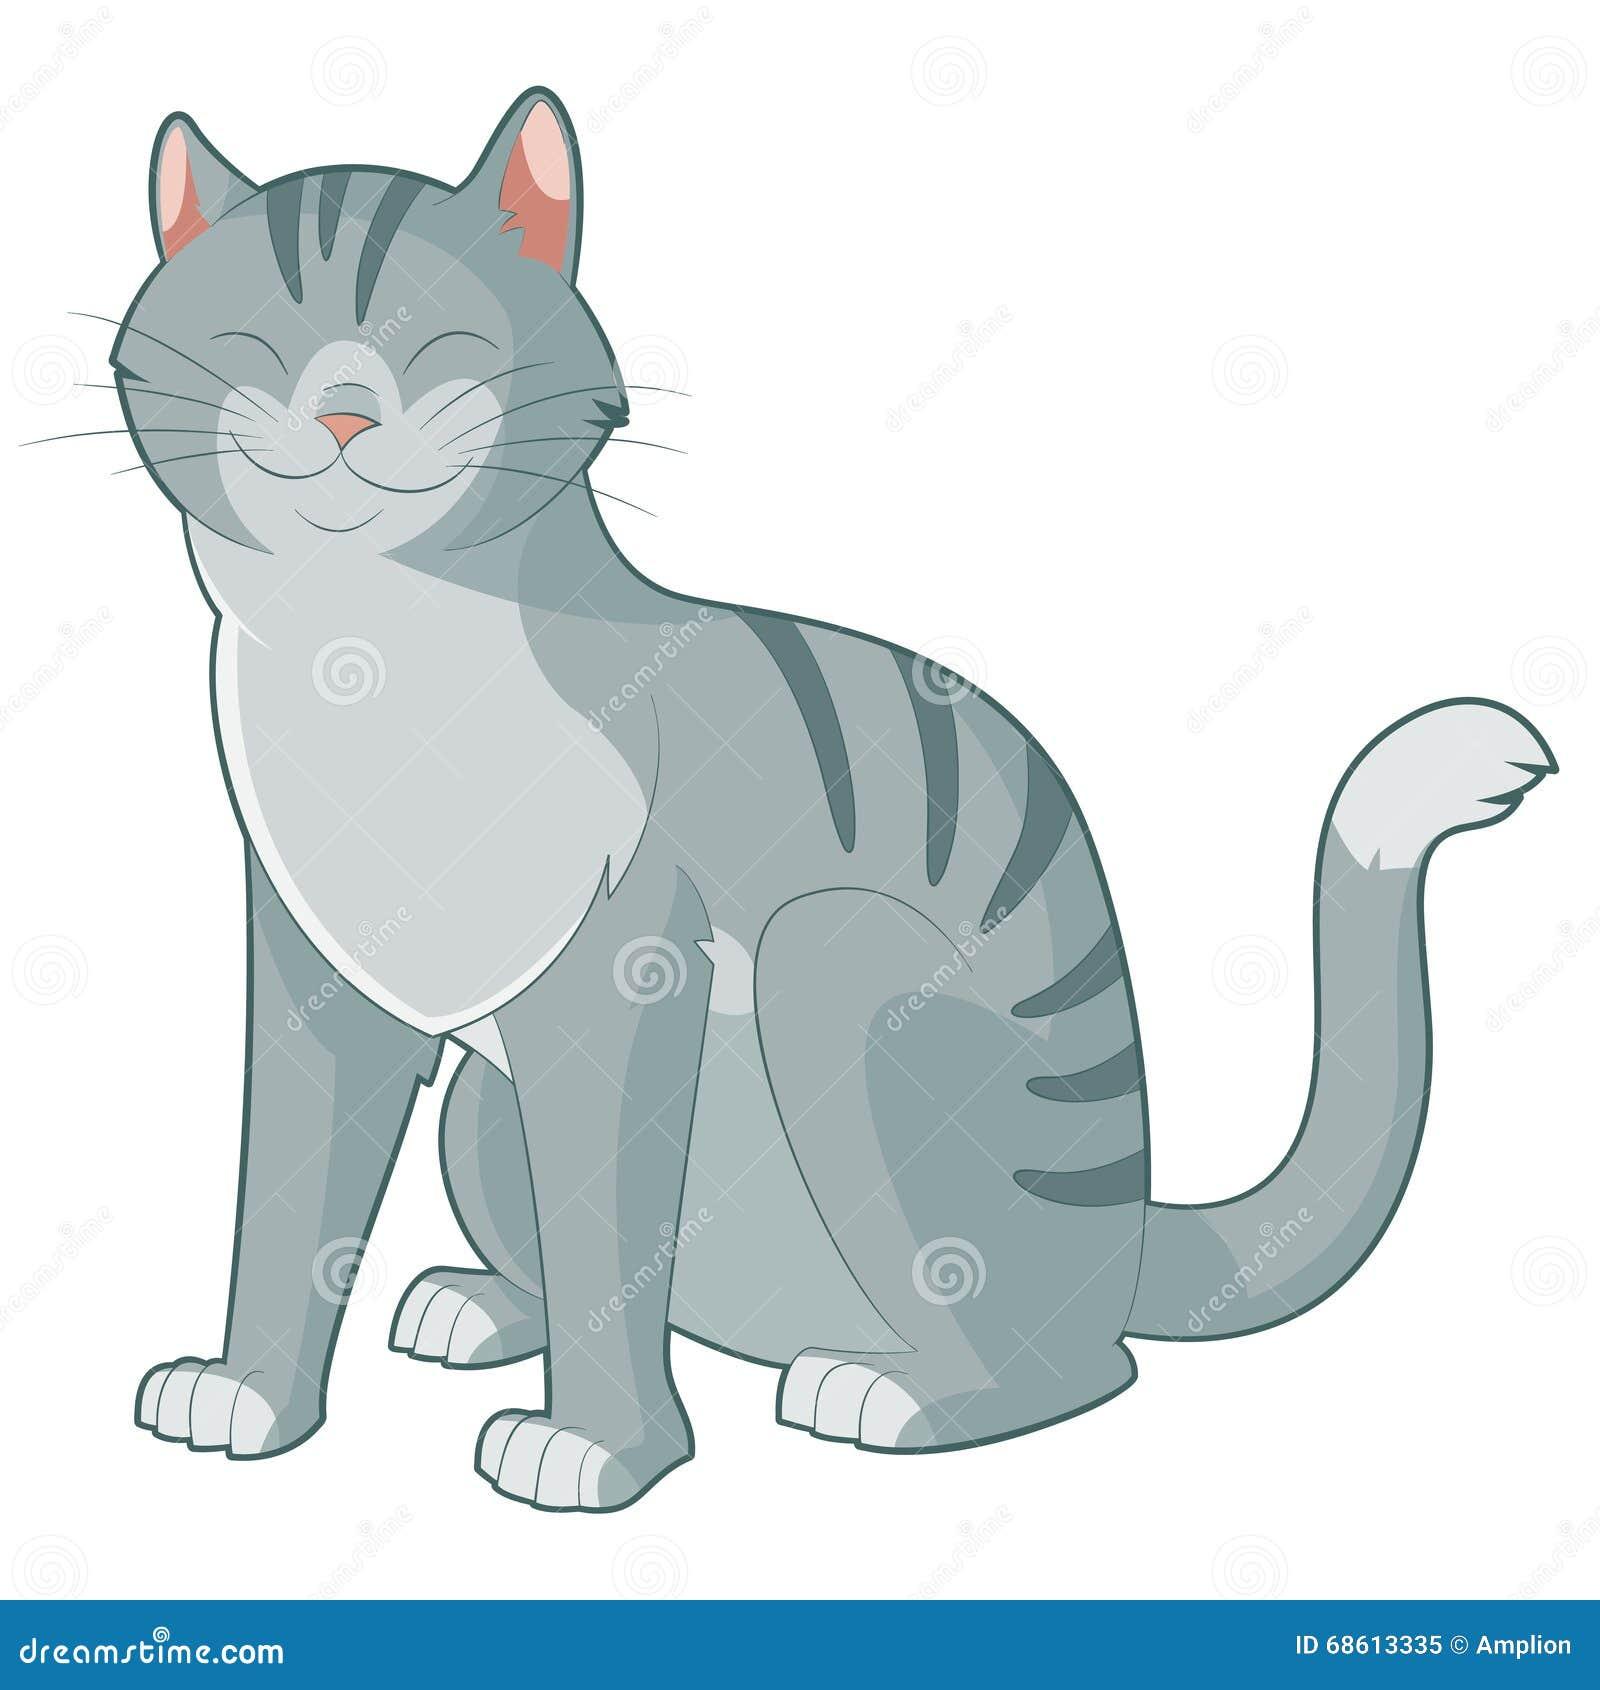 Cartoon Smiling Cat Stock Vector - Image: 68613335